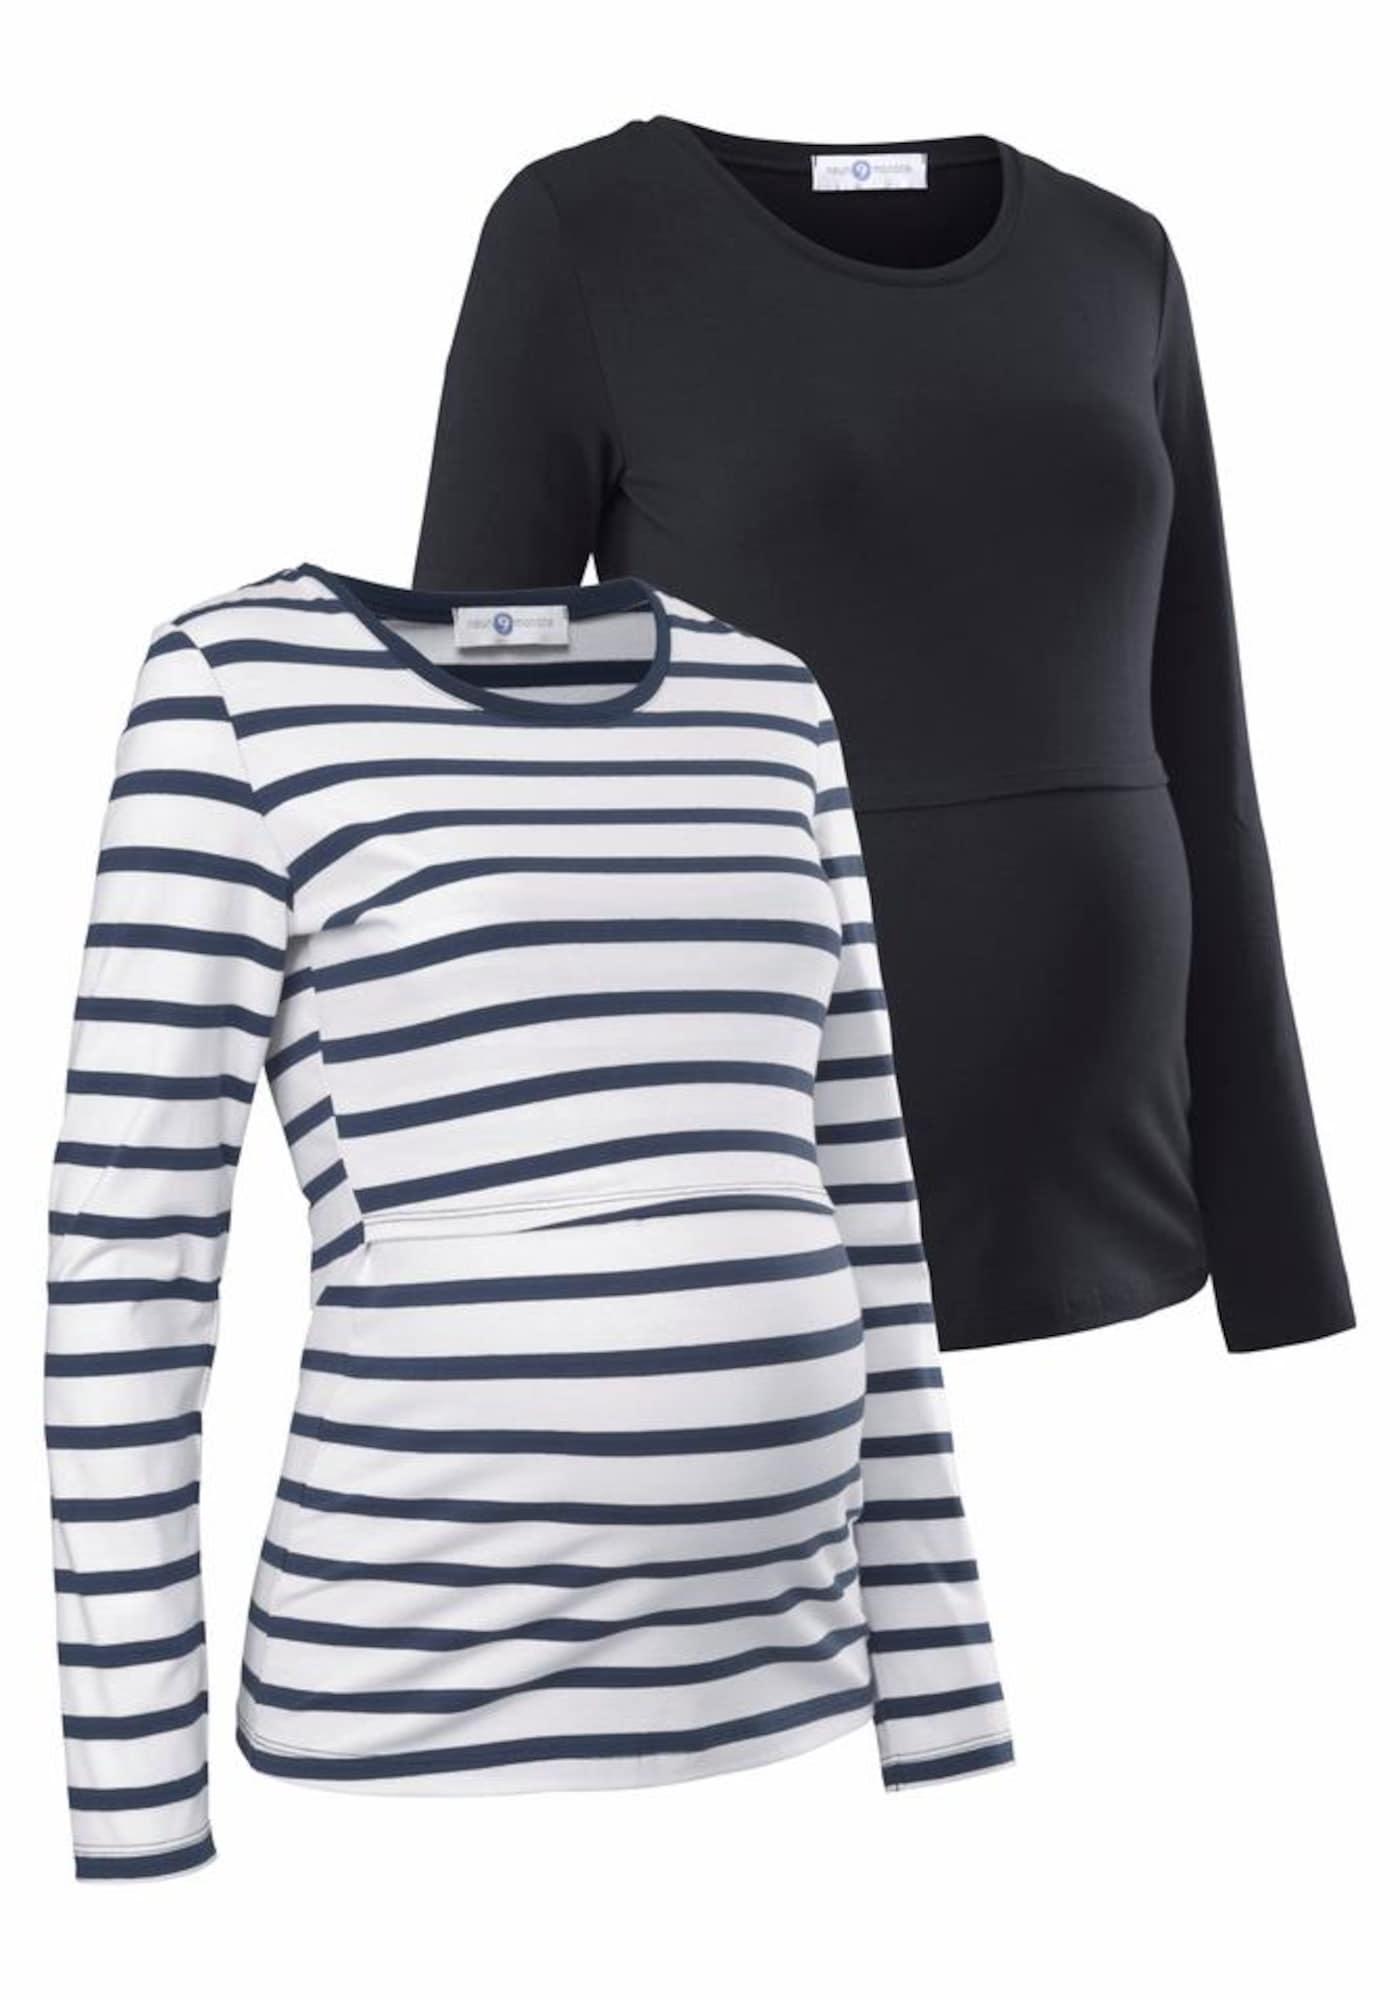 Umstandsshirt | Bekleidung > Umstandsmode > Umstandsshirts | neun monate